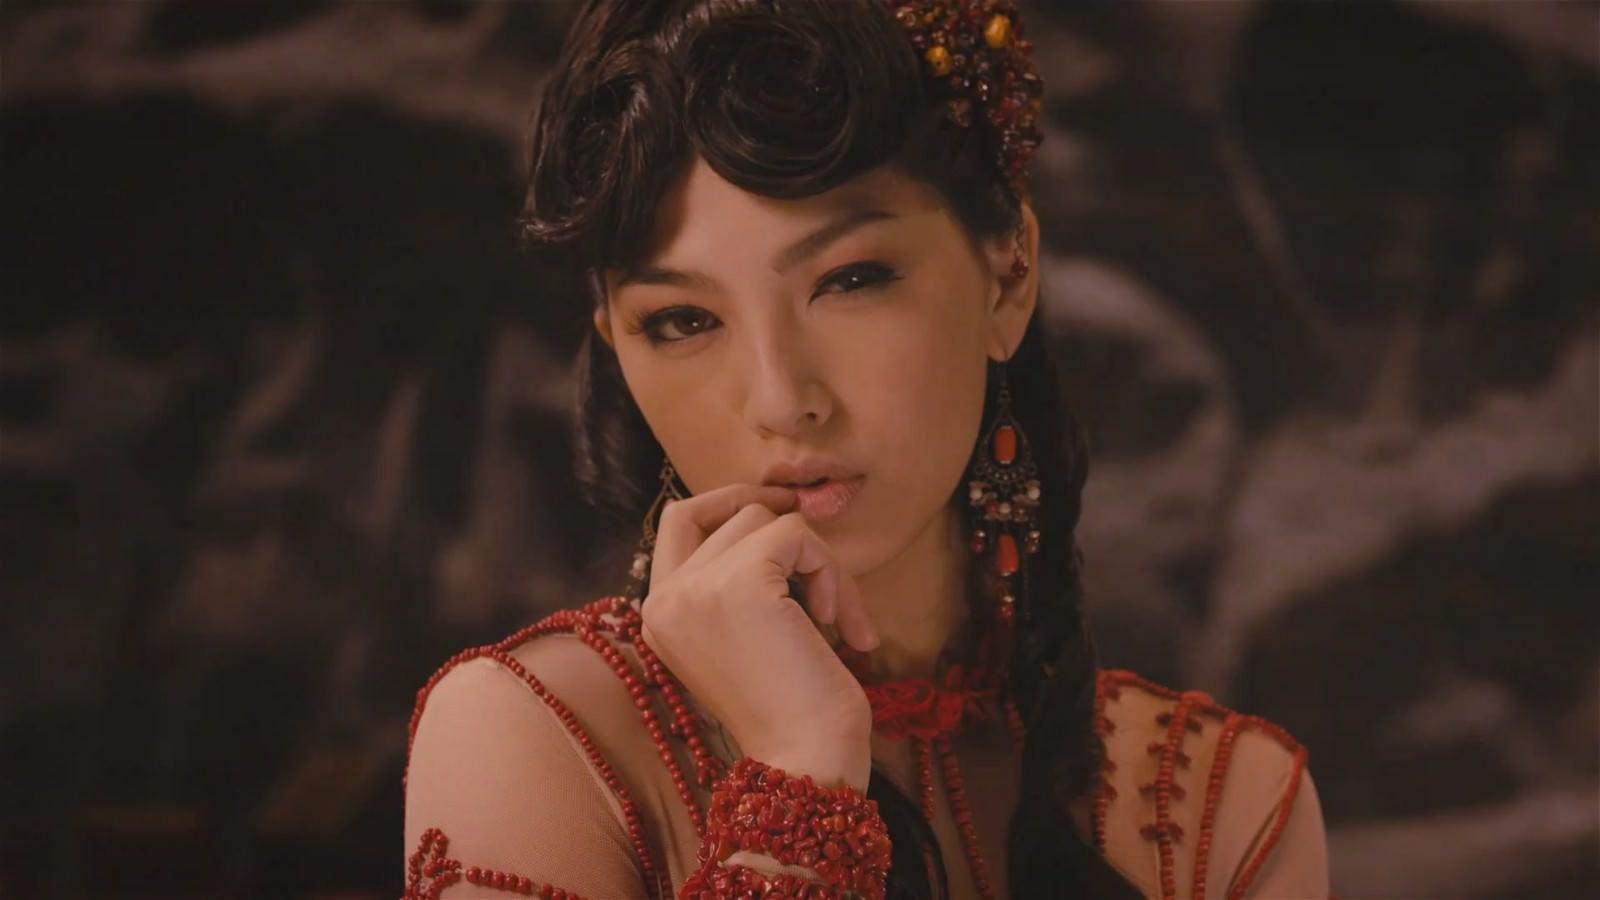 Movie, 3D肉蒲團之極樂寶鑑(香港, 2011年) / 3D肉蒲團之極樂寶鑑(台灣) / 3D Sex and Zen: Extreme Ecstasy(英文), 電影角色與演員介紹